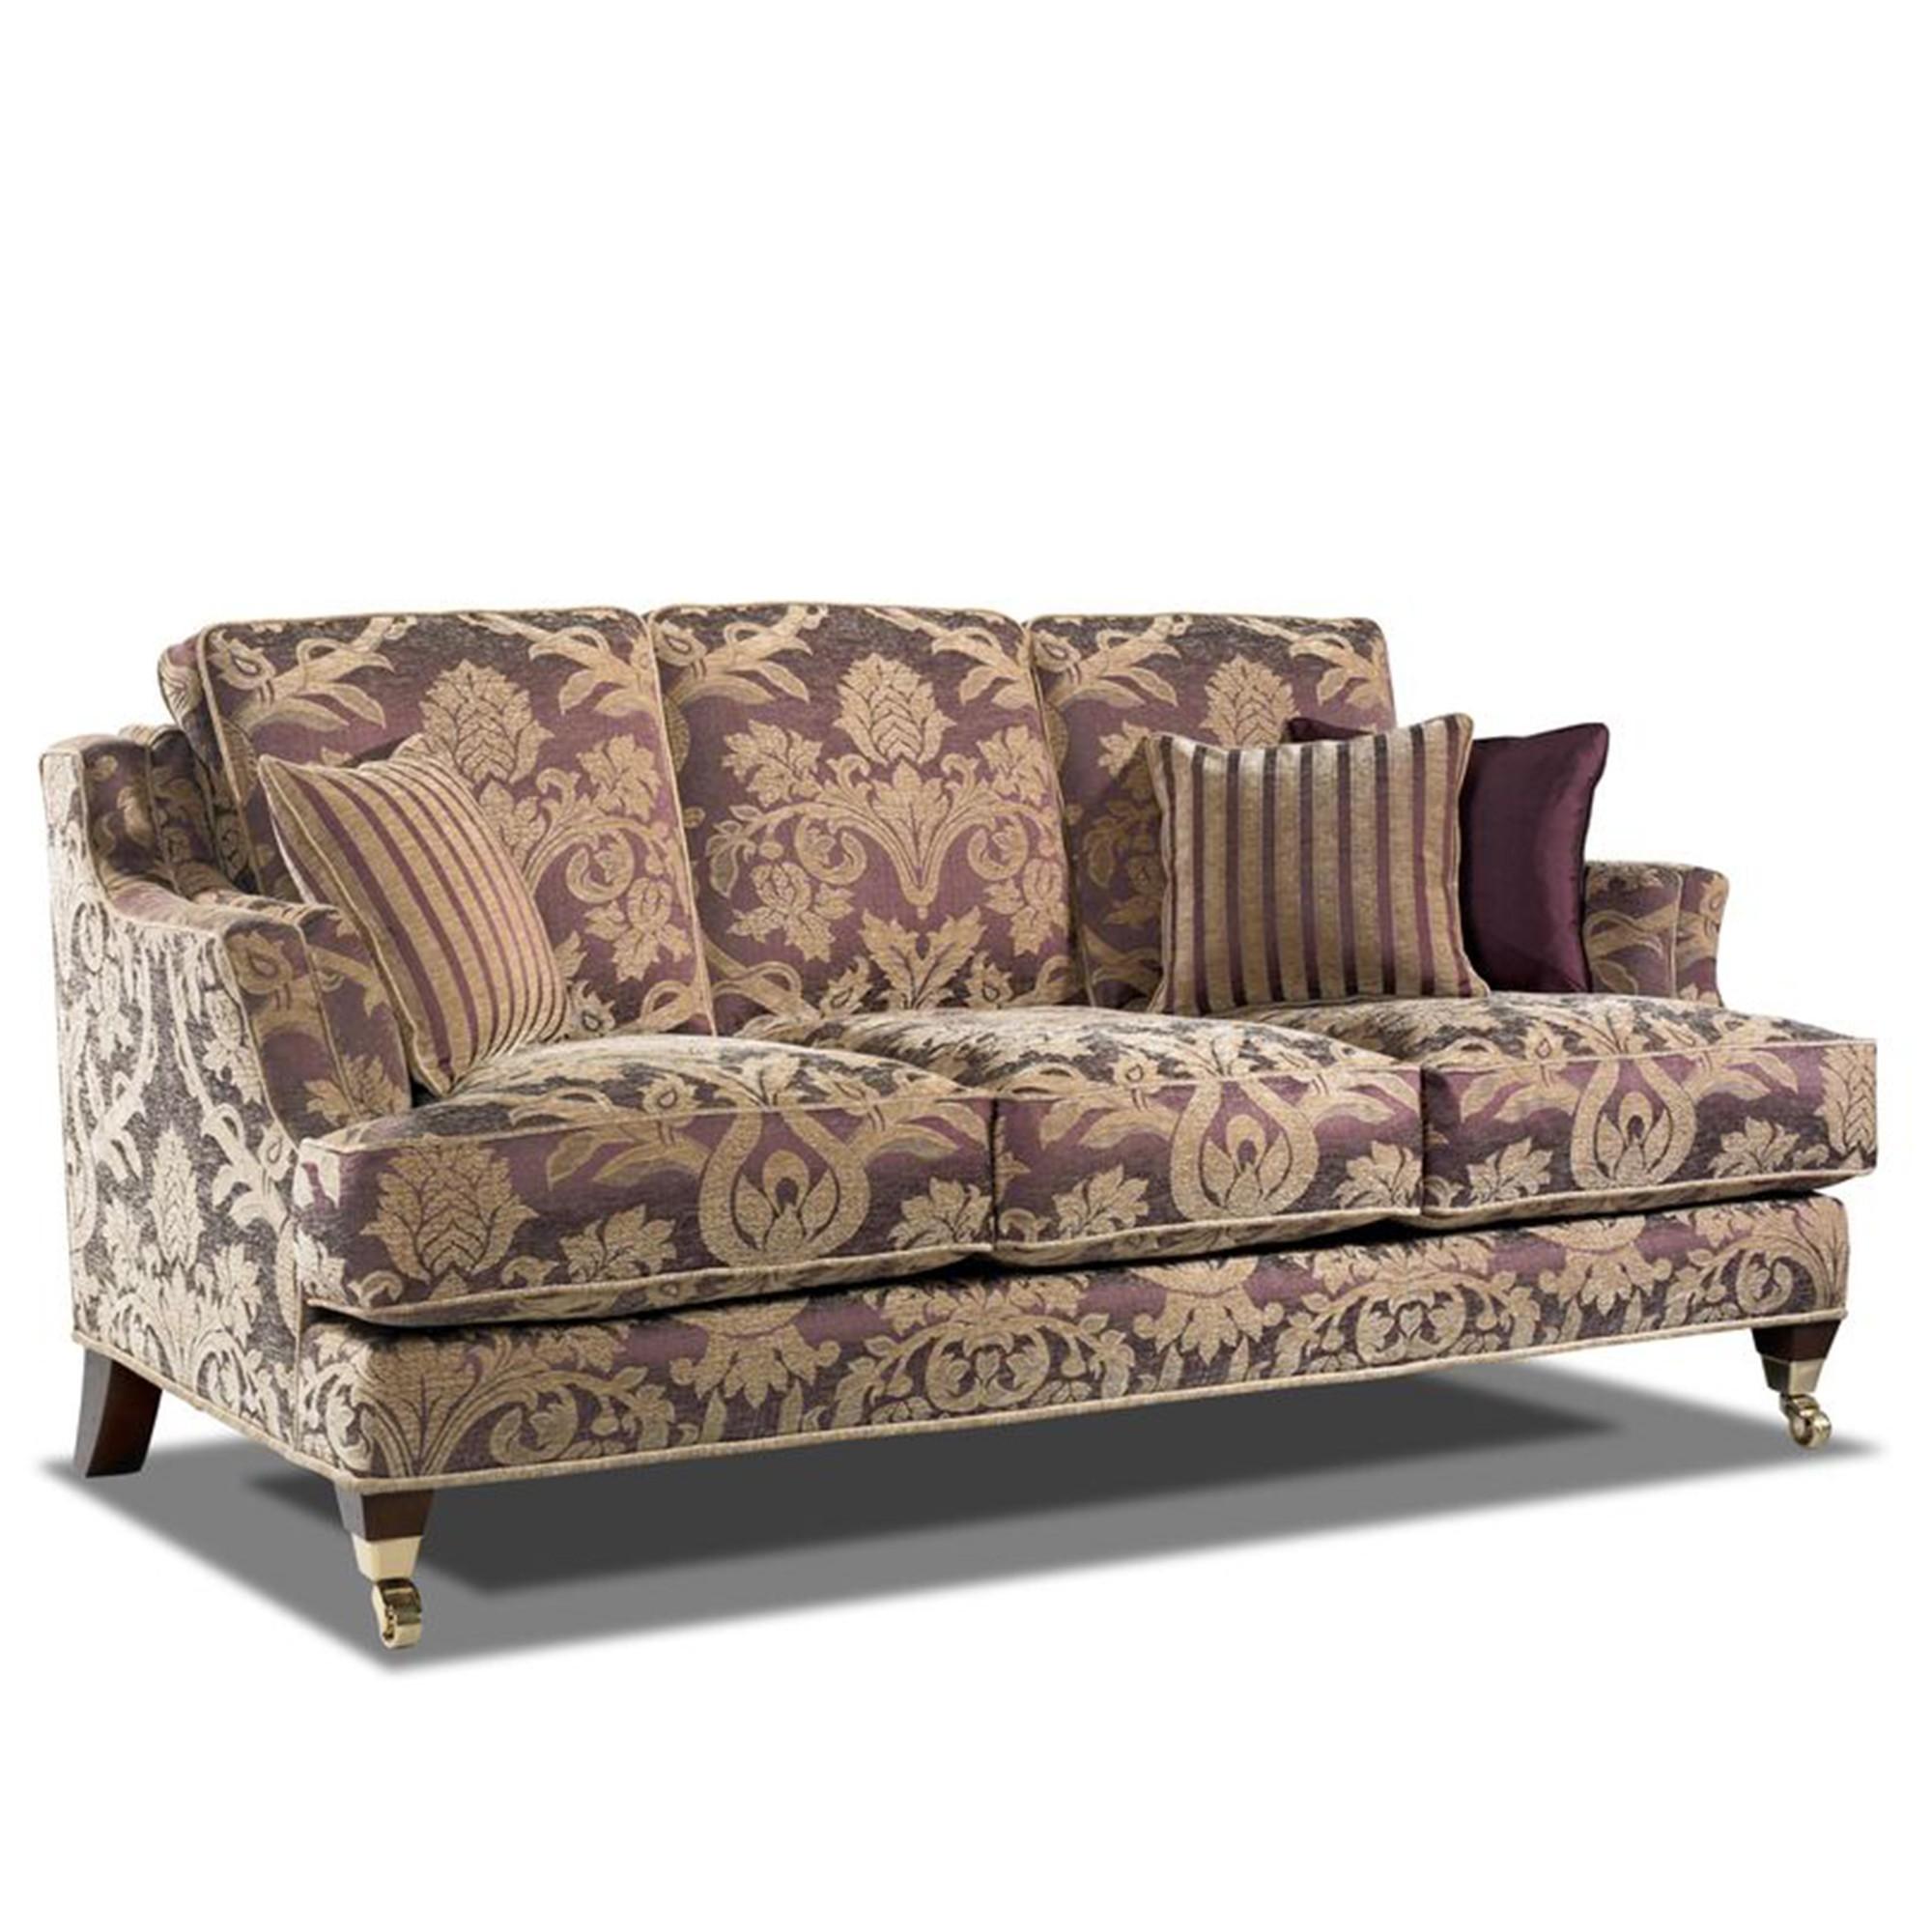 Wade Upholstery Kempston 3 Seater Sofa Leather Sofas